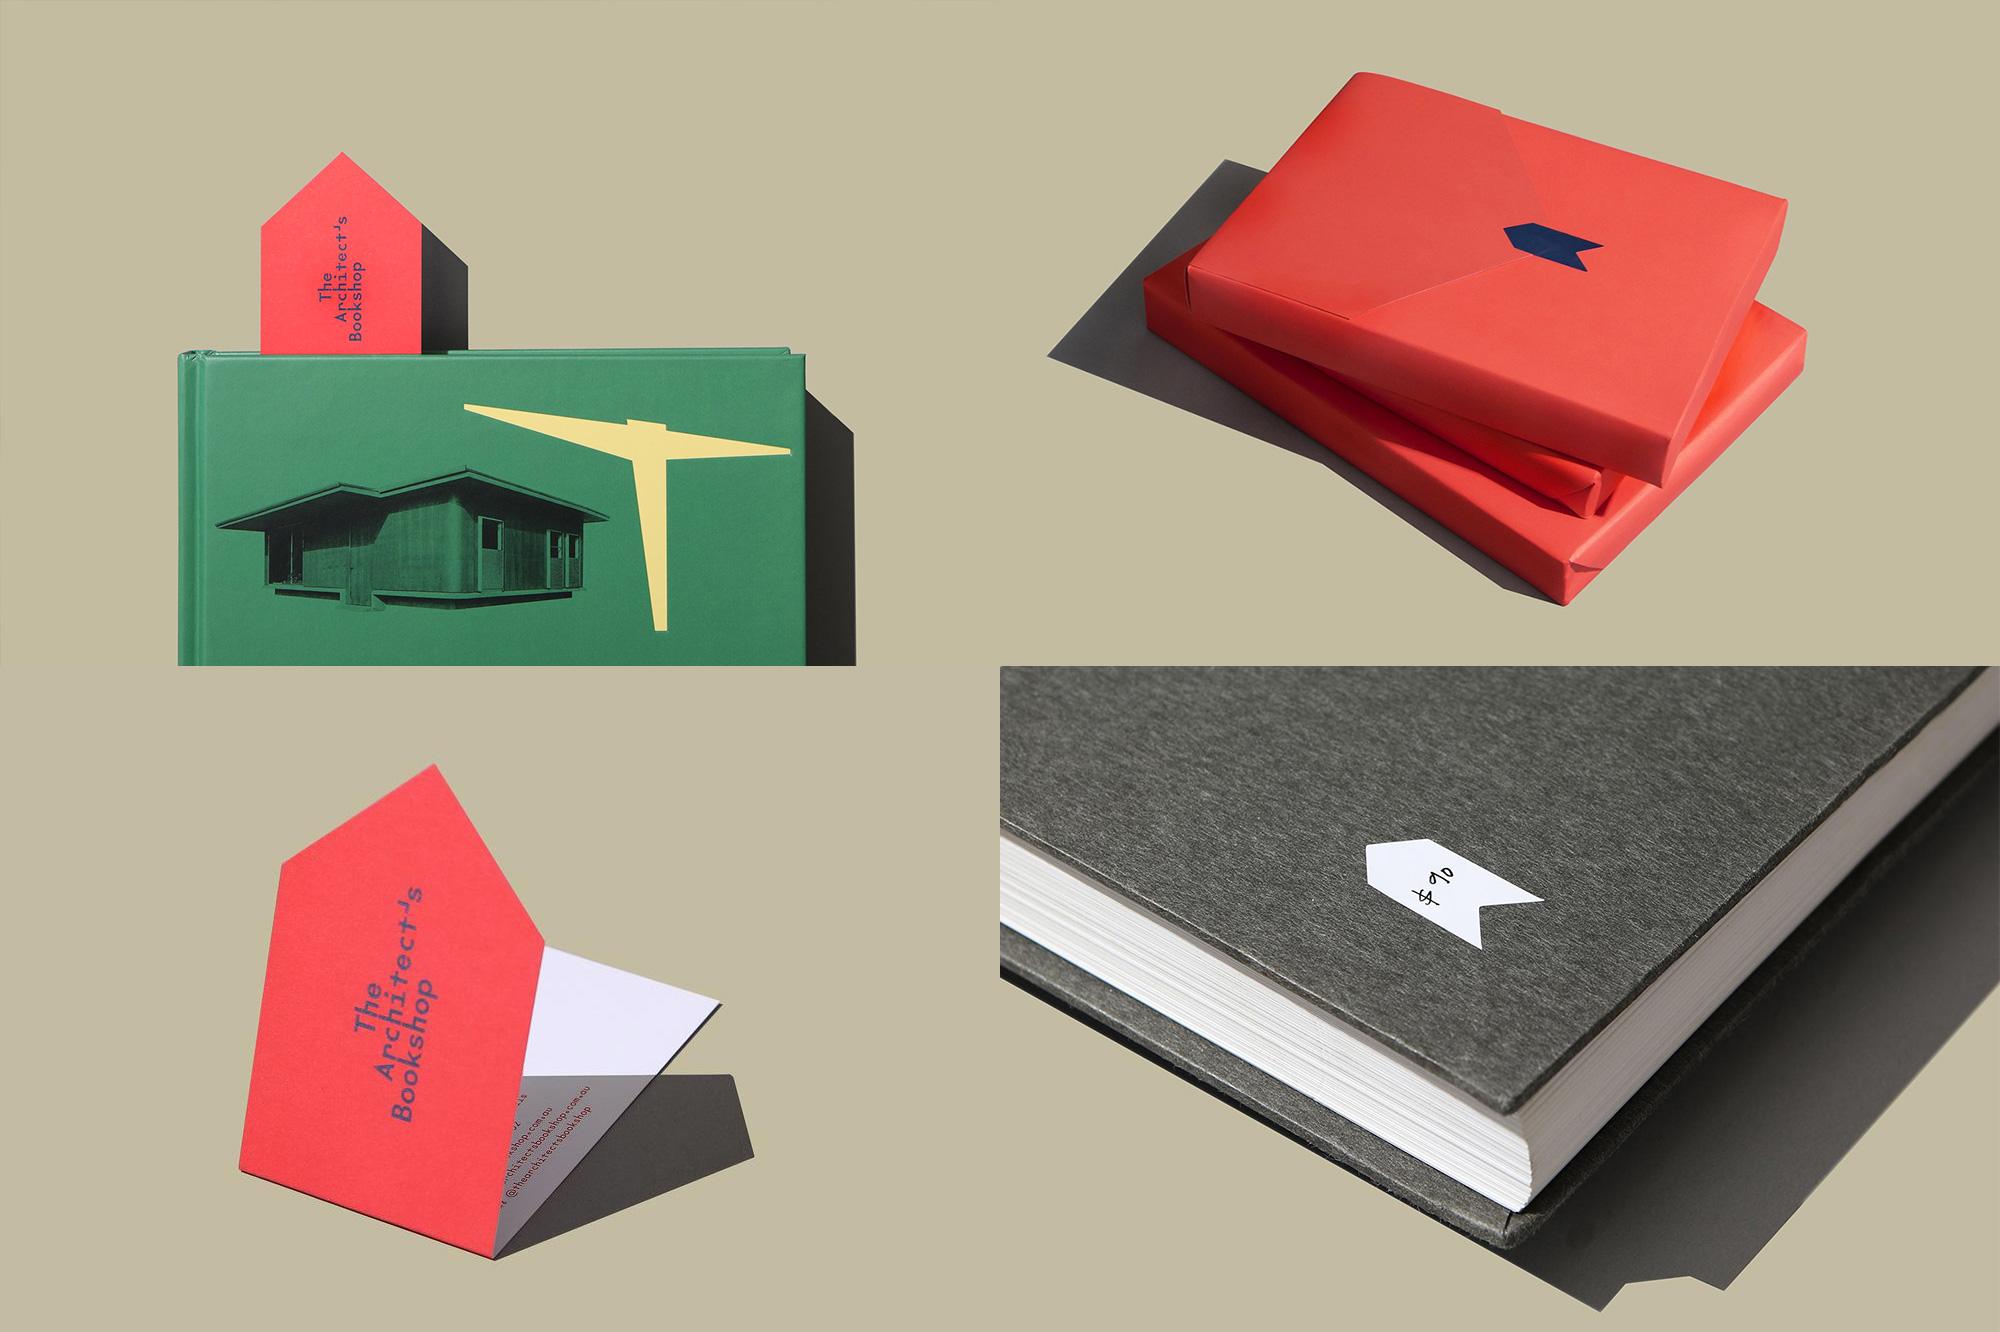 The Architect's Bookshop by Garbett Design